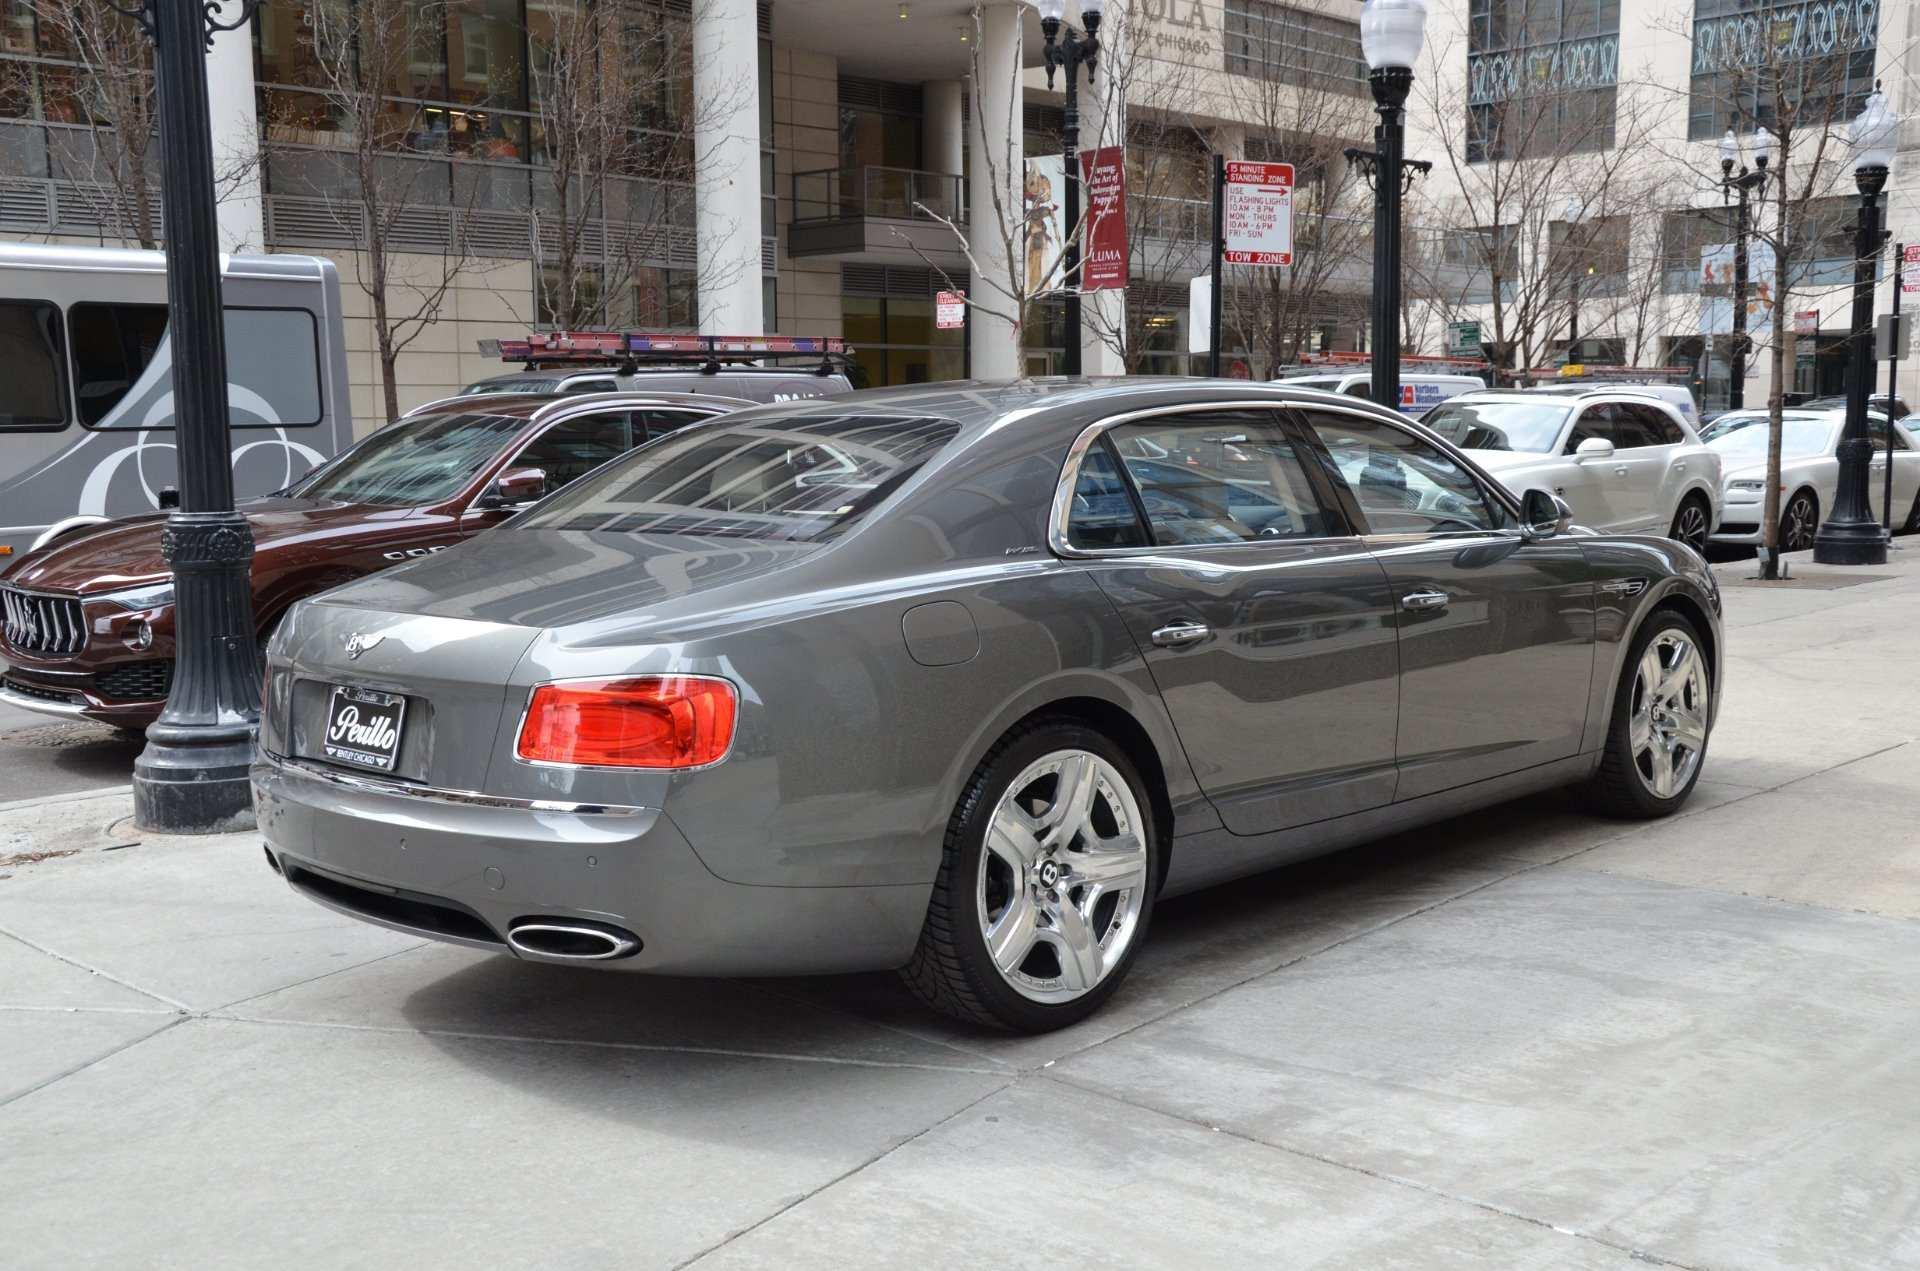 33 Concept of Bentley Neuheiten 2020 Engine with Bentley Neuheiten 2020